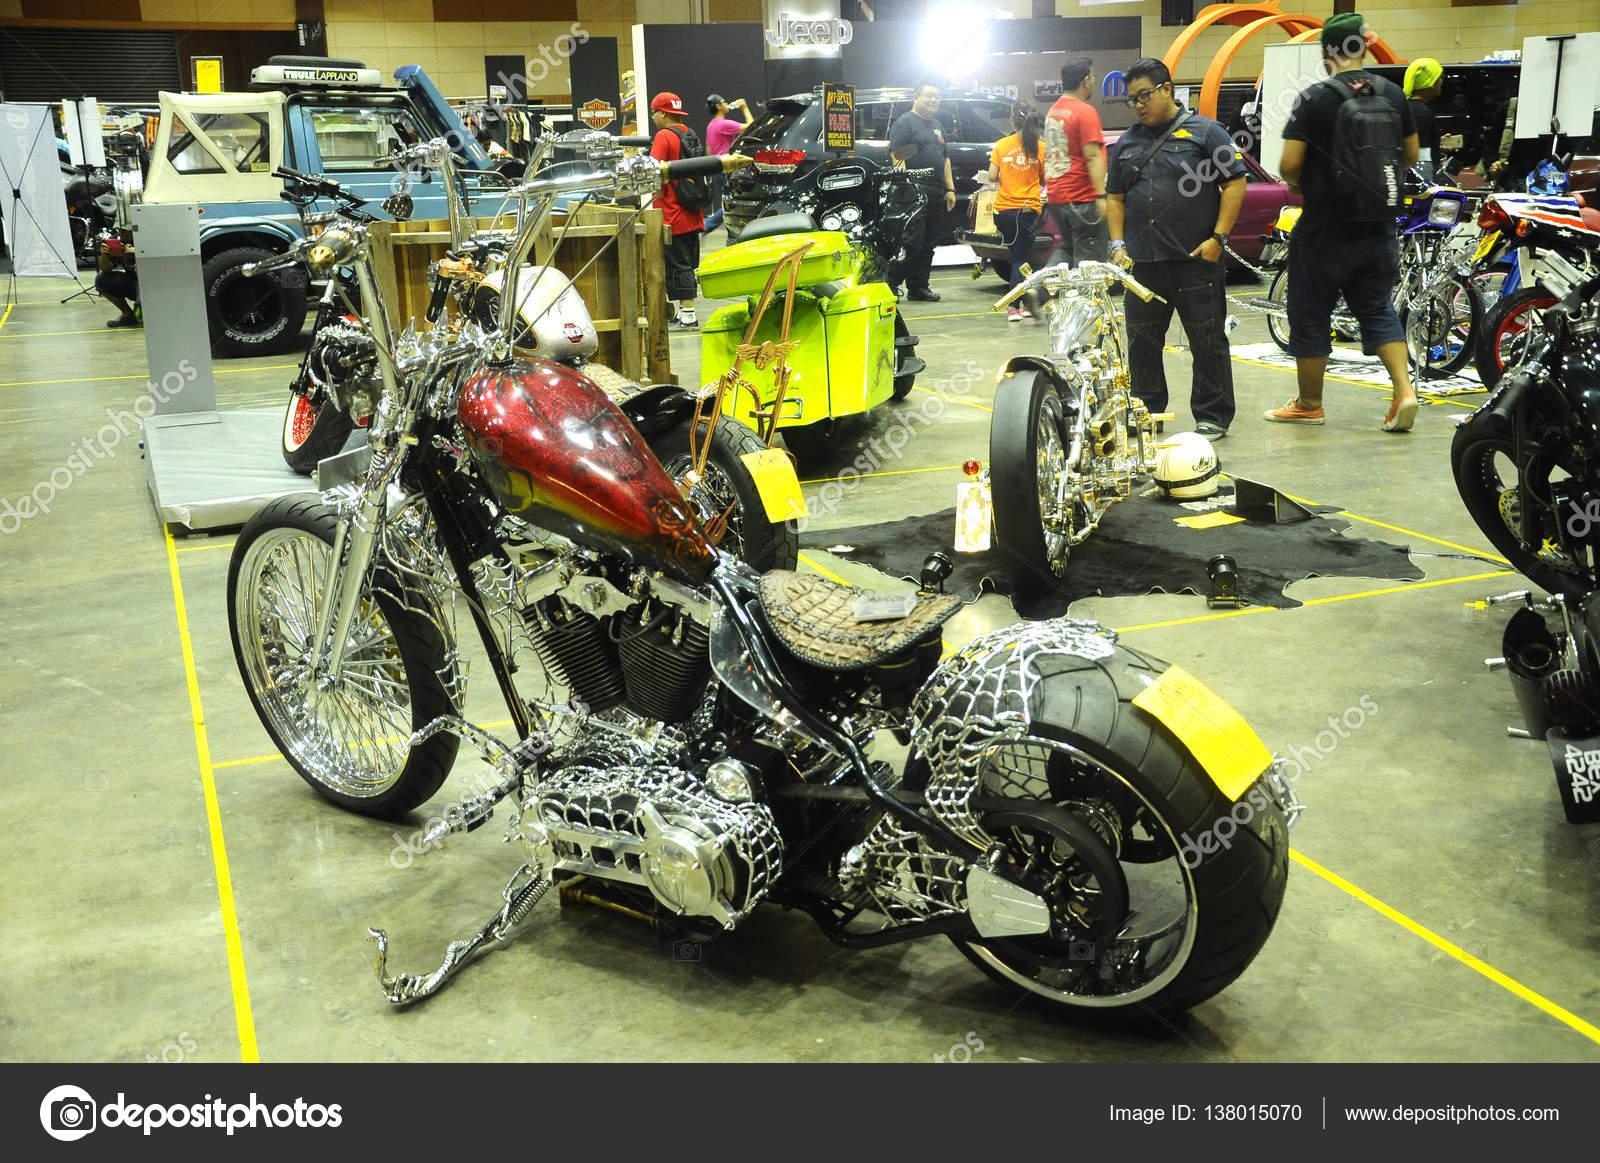 Imagenes De Motos Harley: Custom Motos Harley Davidson